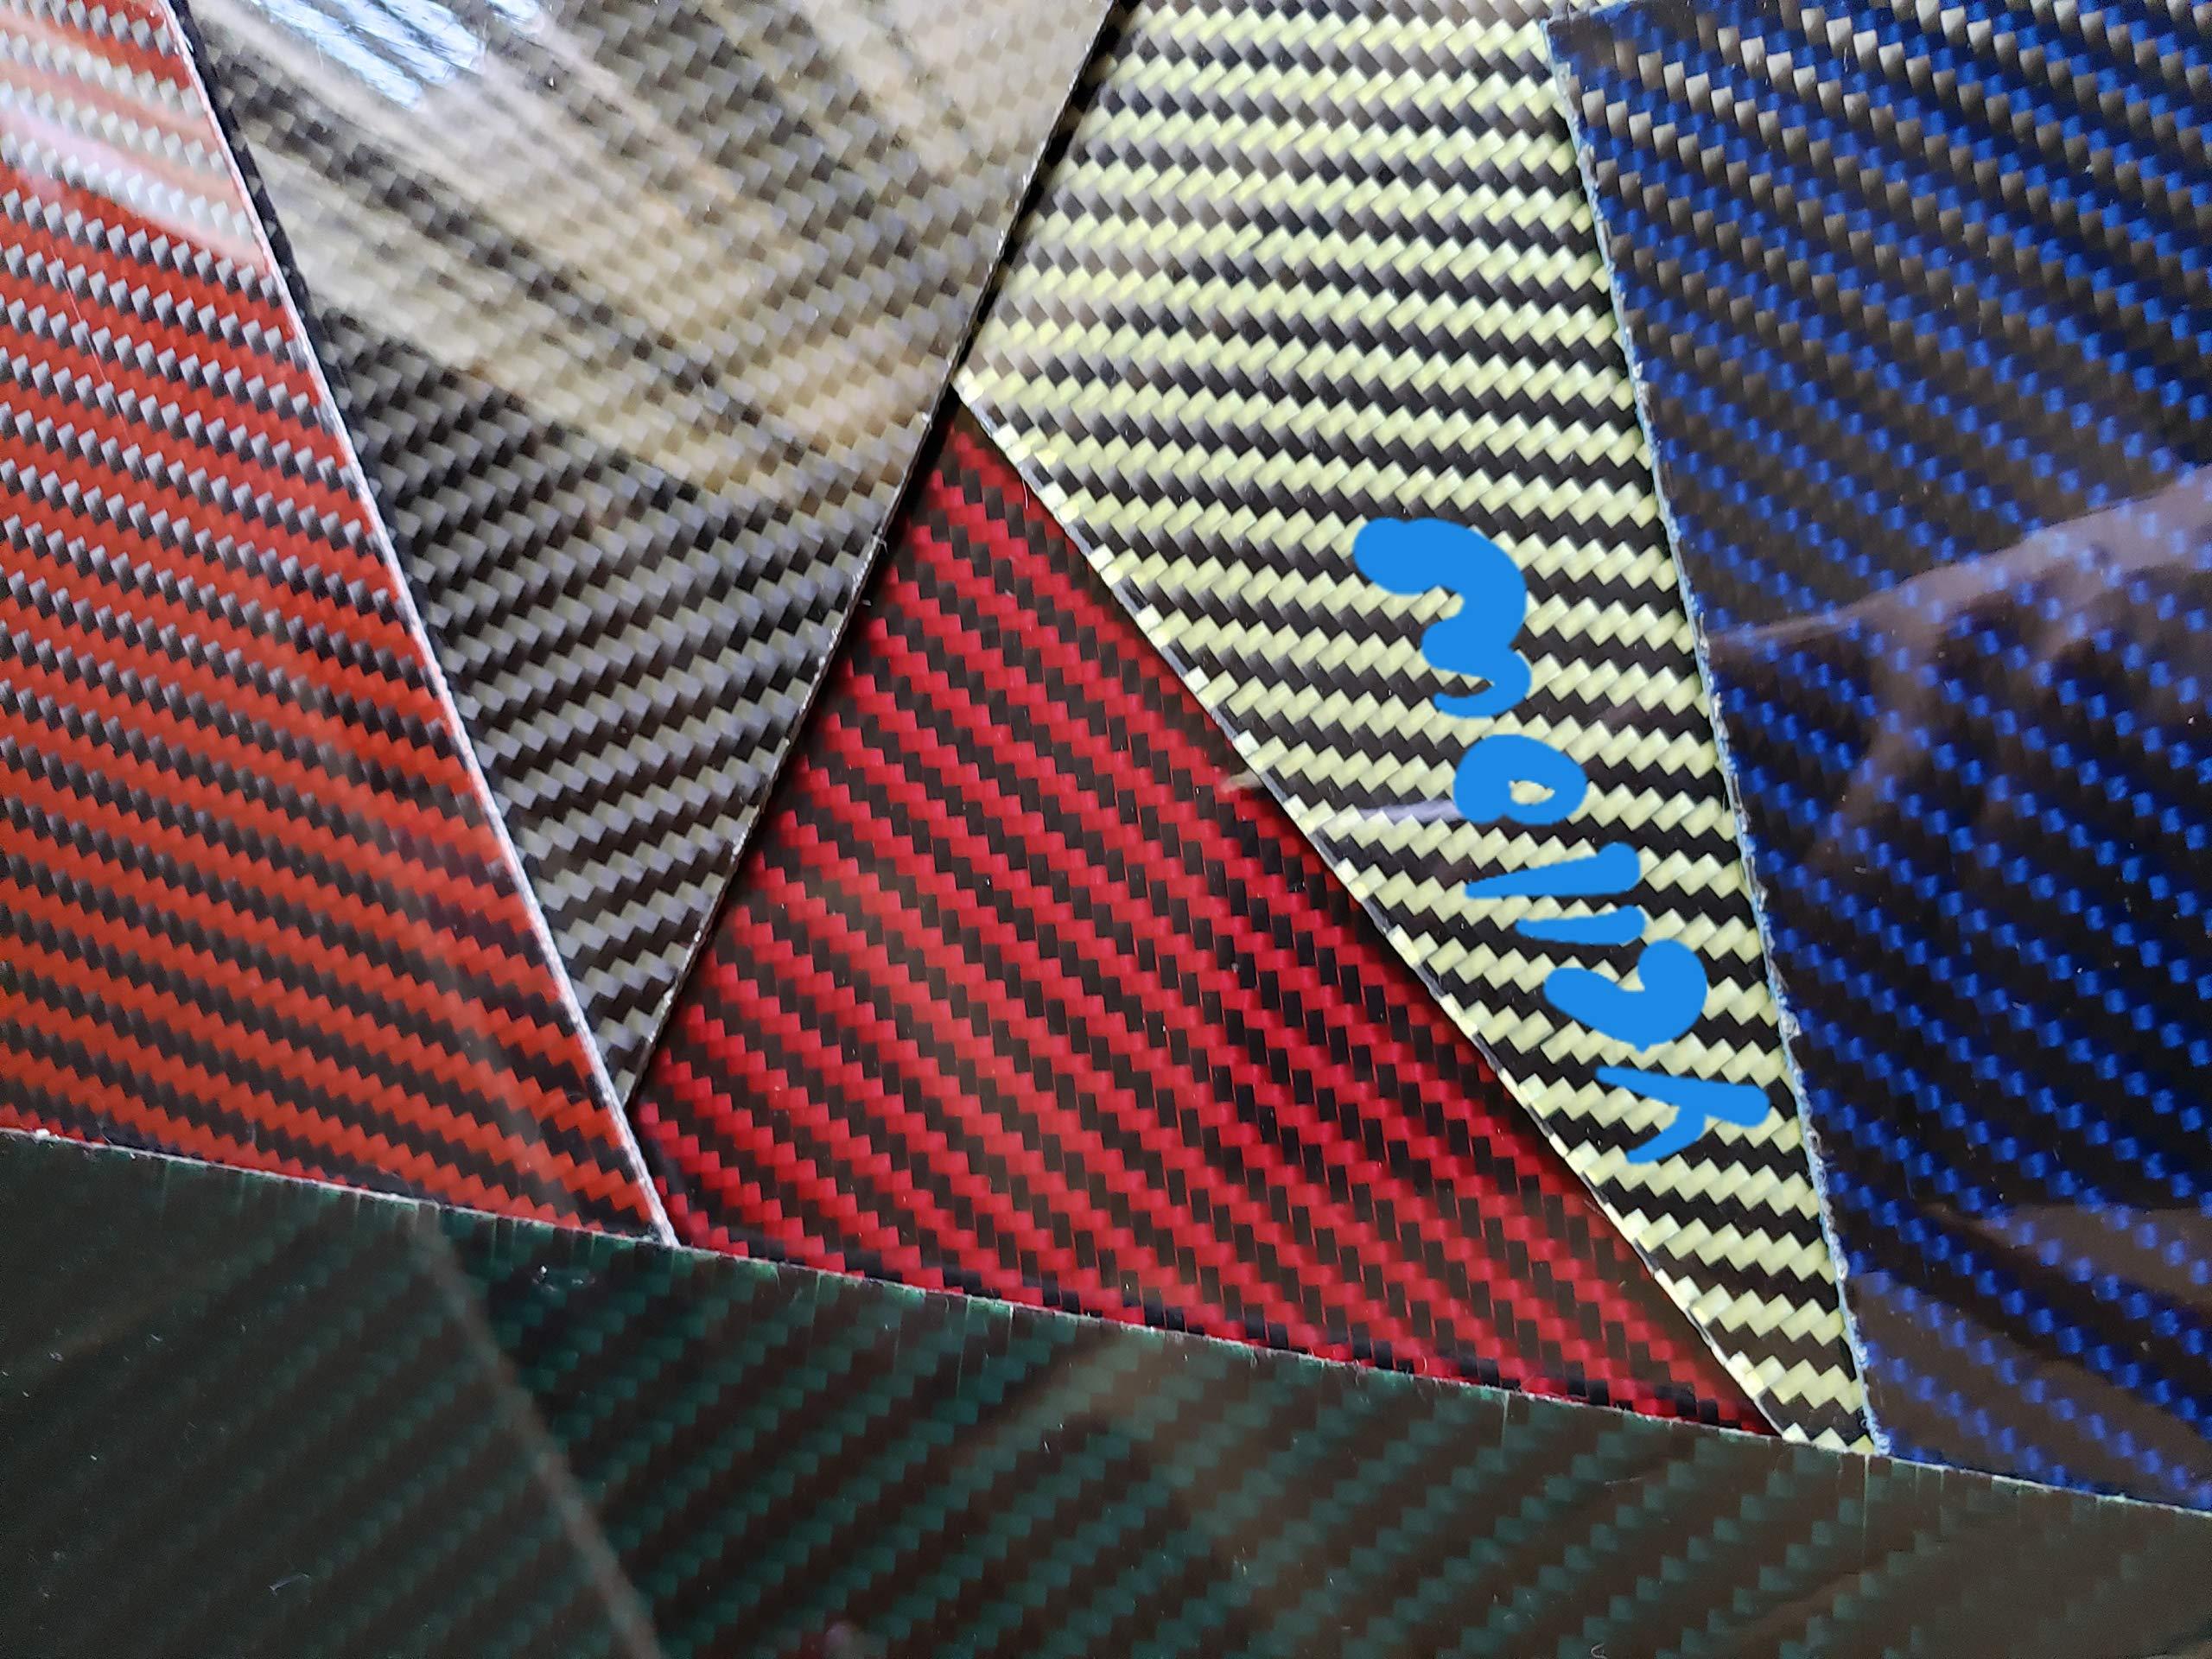 12''x30''x1/32'' Yellow 2x2 Twill Carbon Fiber with Kevlar Hybrid Fiberglass Plate Board Sheet Panel Glossy One Side by CFS